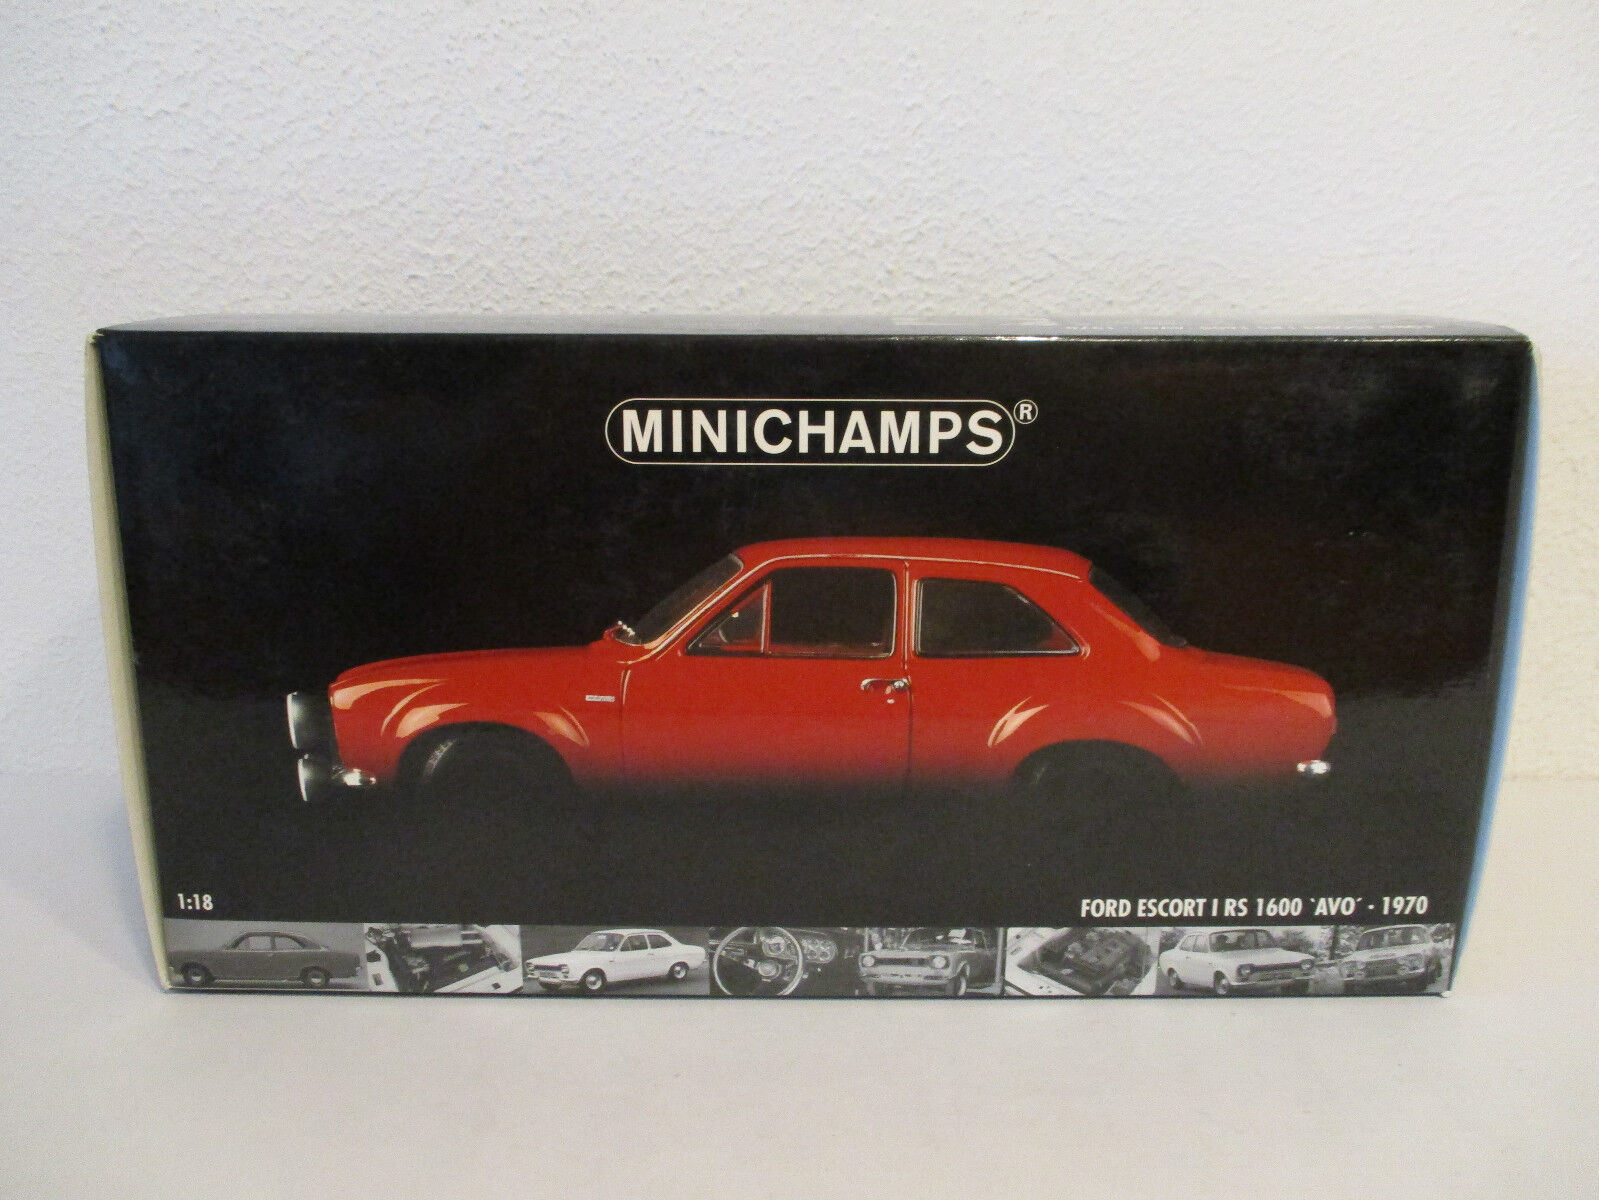 (Gol ) 1 18 Minichamps Ford Escort I Rs 1600 Avo 1970 New Original Package